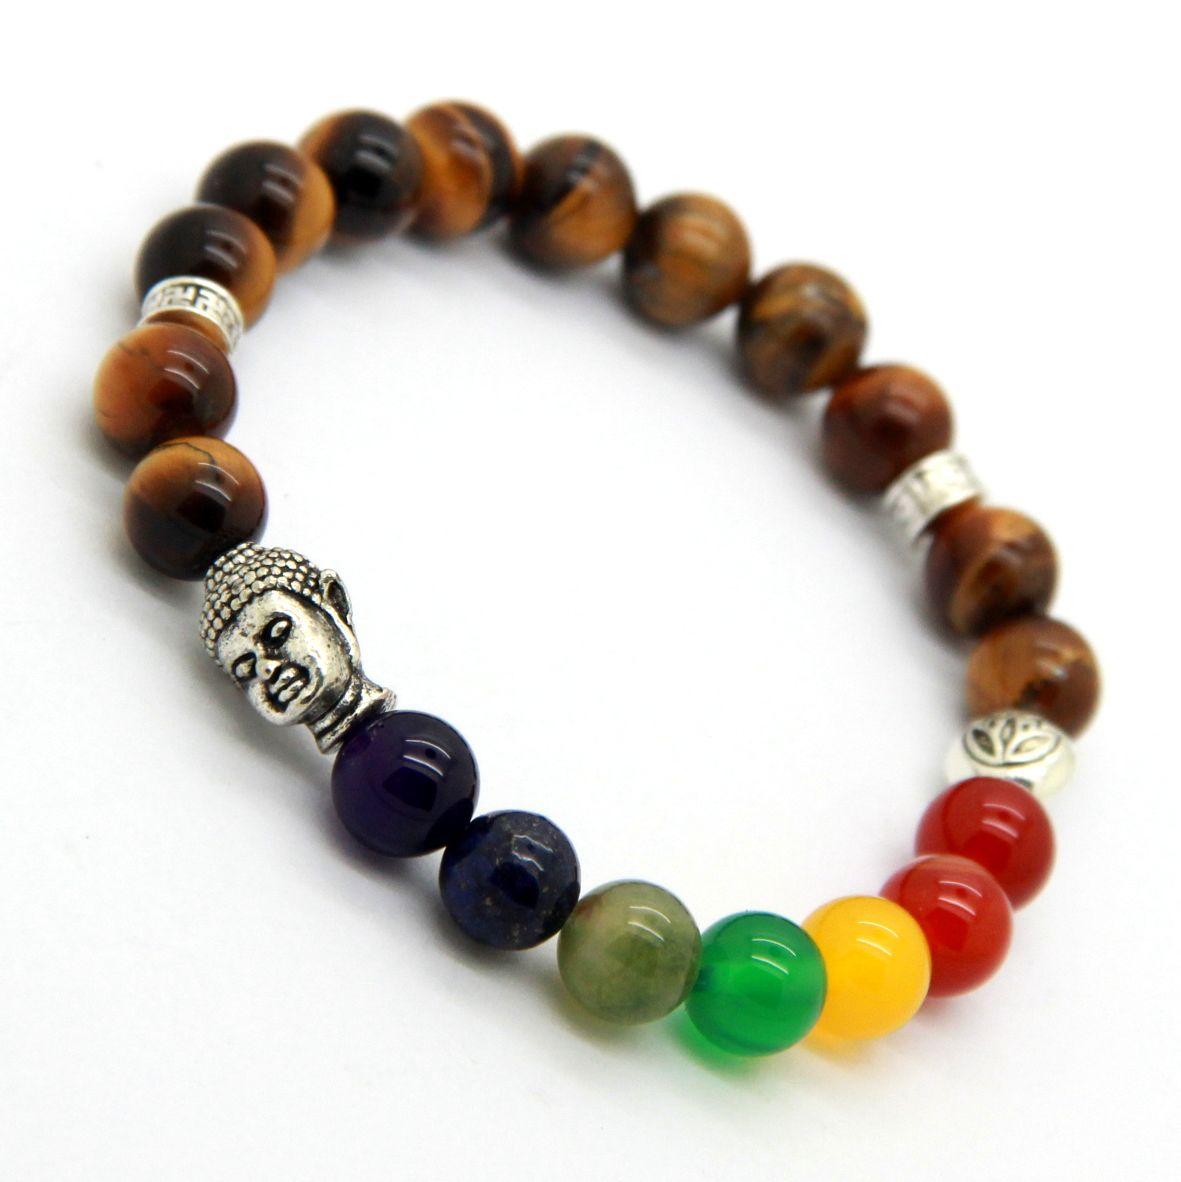 New Products Wholesale 8mm Natural Tiger Eye Stone Beads 7 Chakra Buddha Bracelet, Yoga Meditation Energy Jewelry